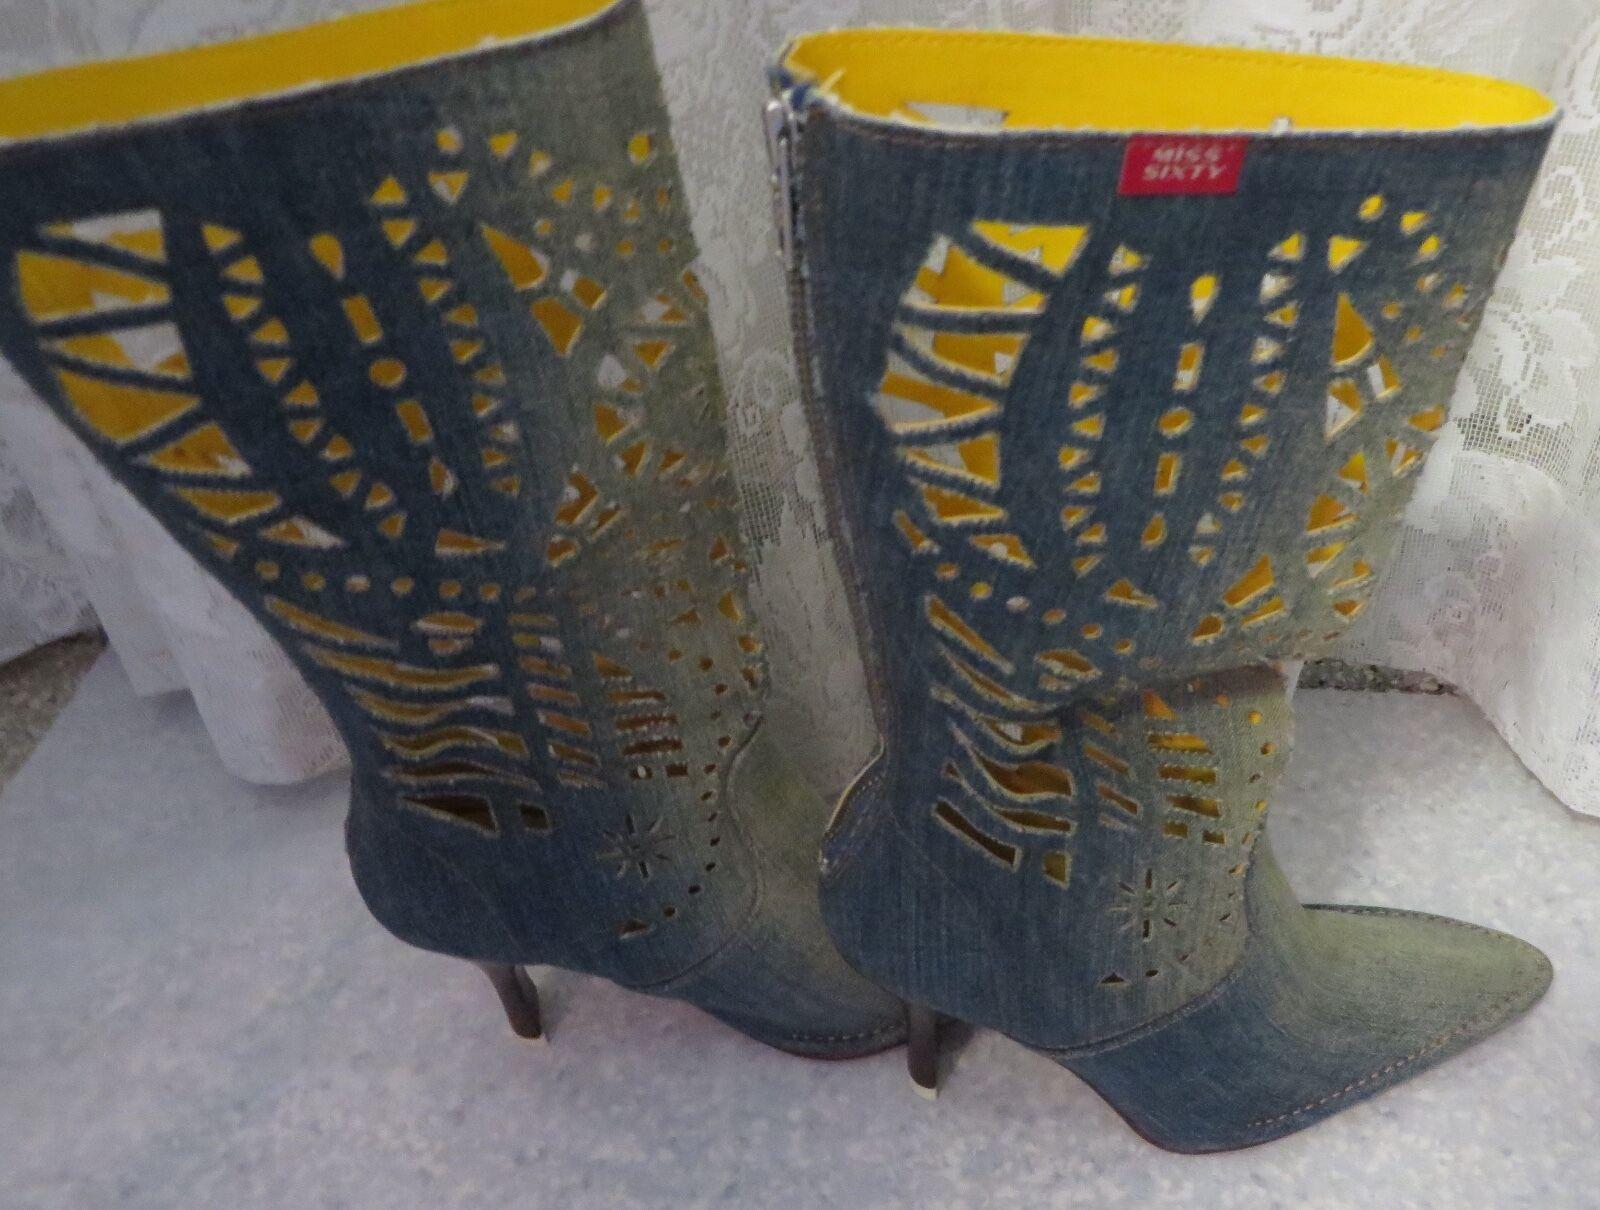 MISS SIXY DENIM BOOTS Lazer Cut Sexy Size 37 6.5 Italy Heel Designer